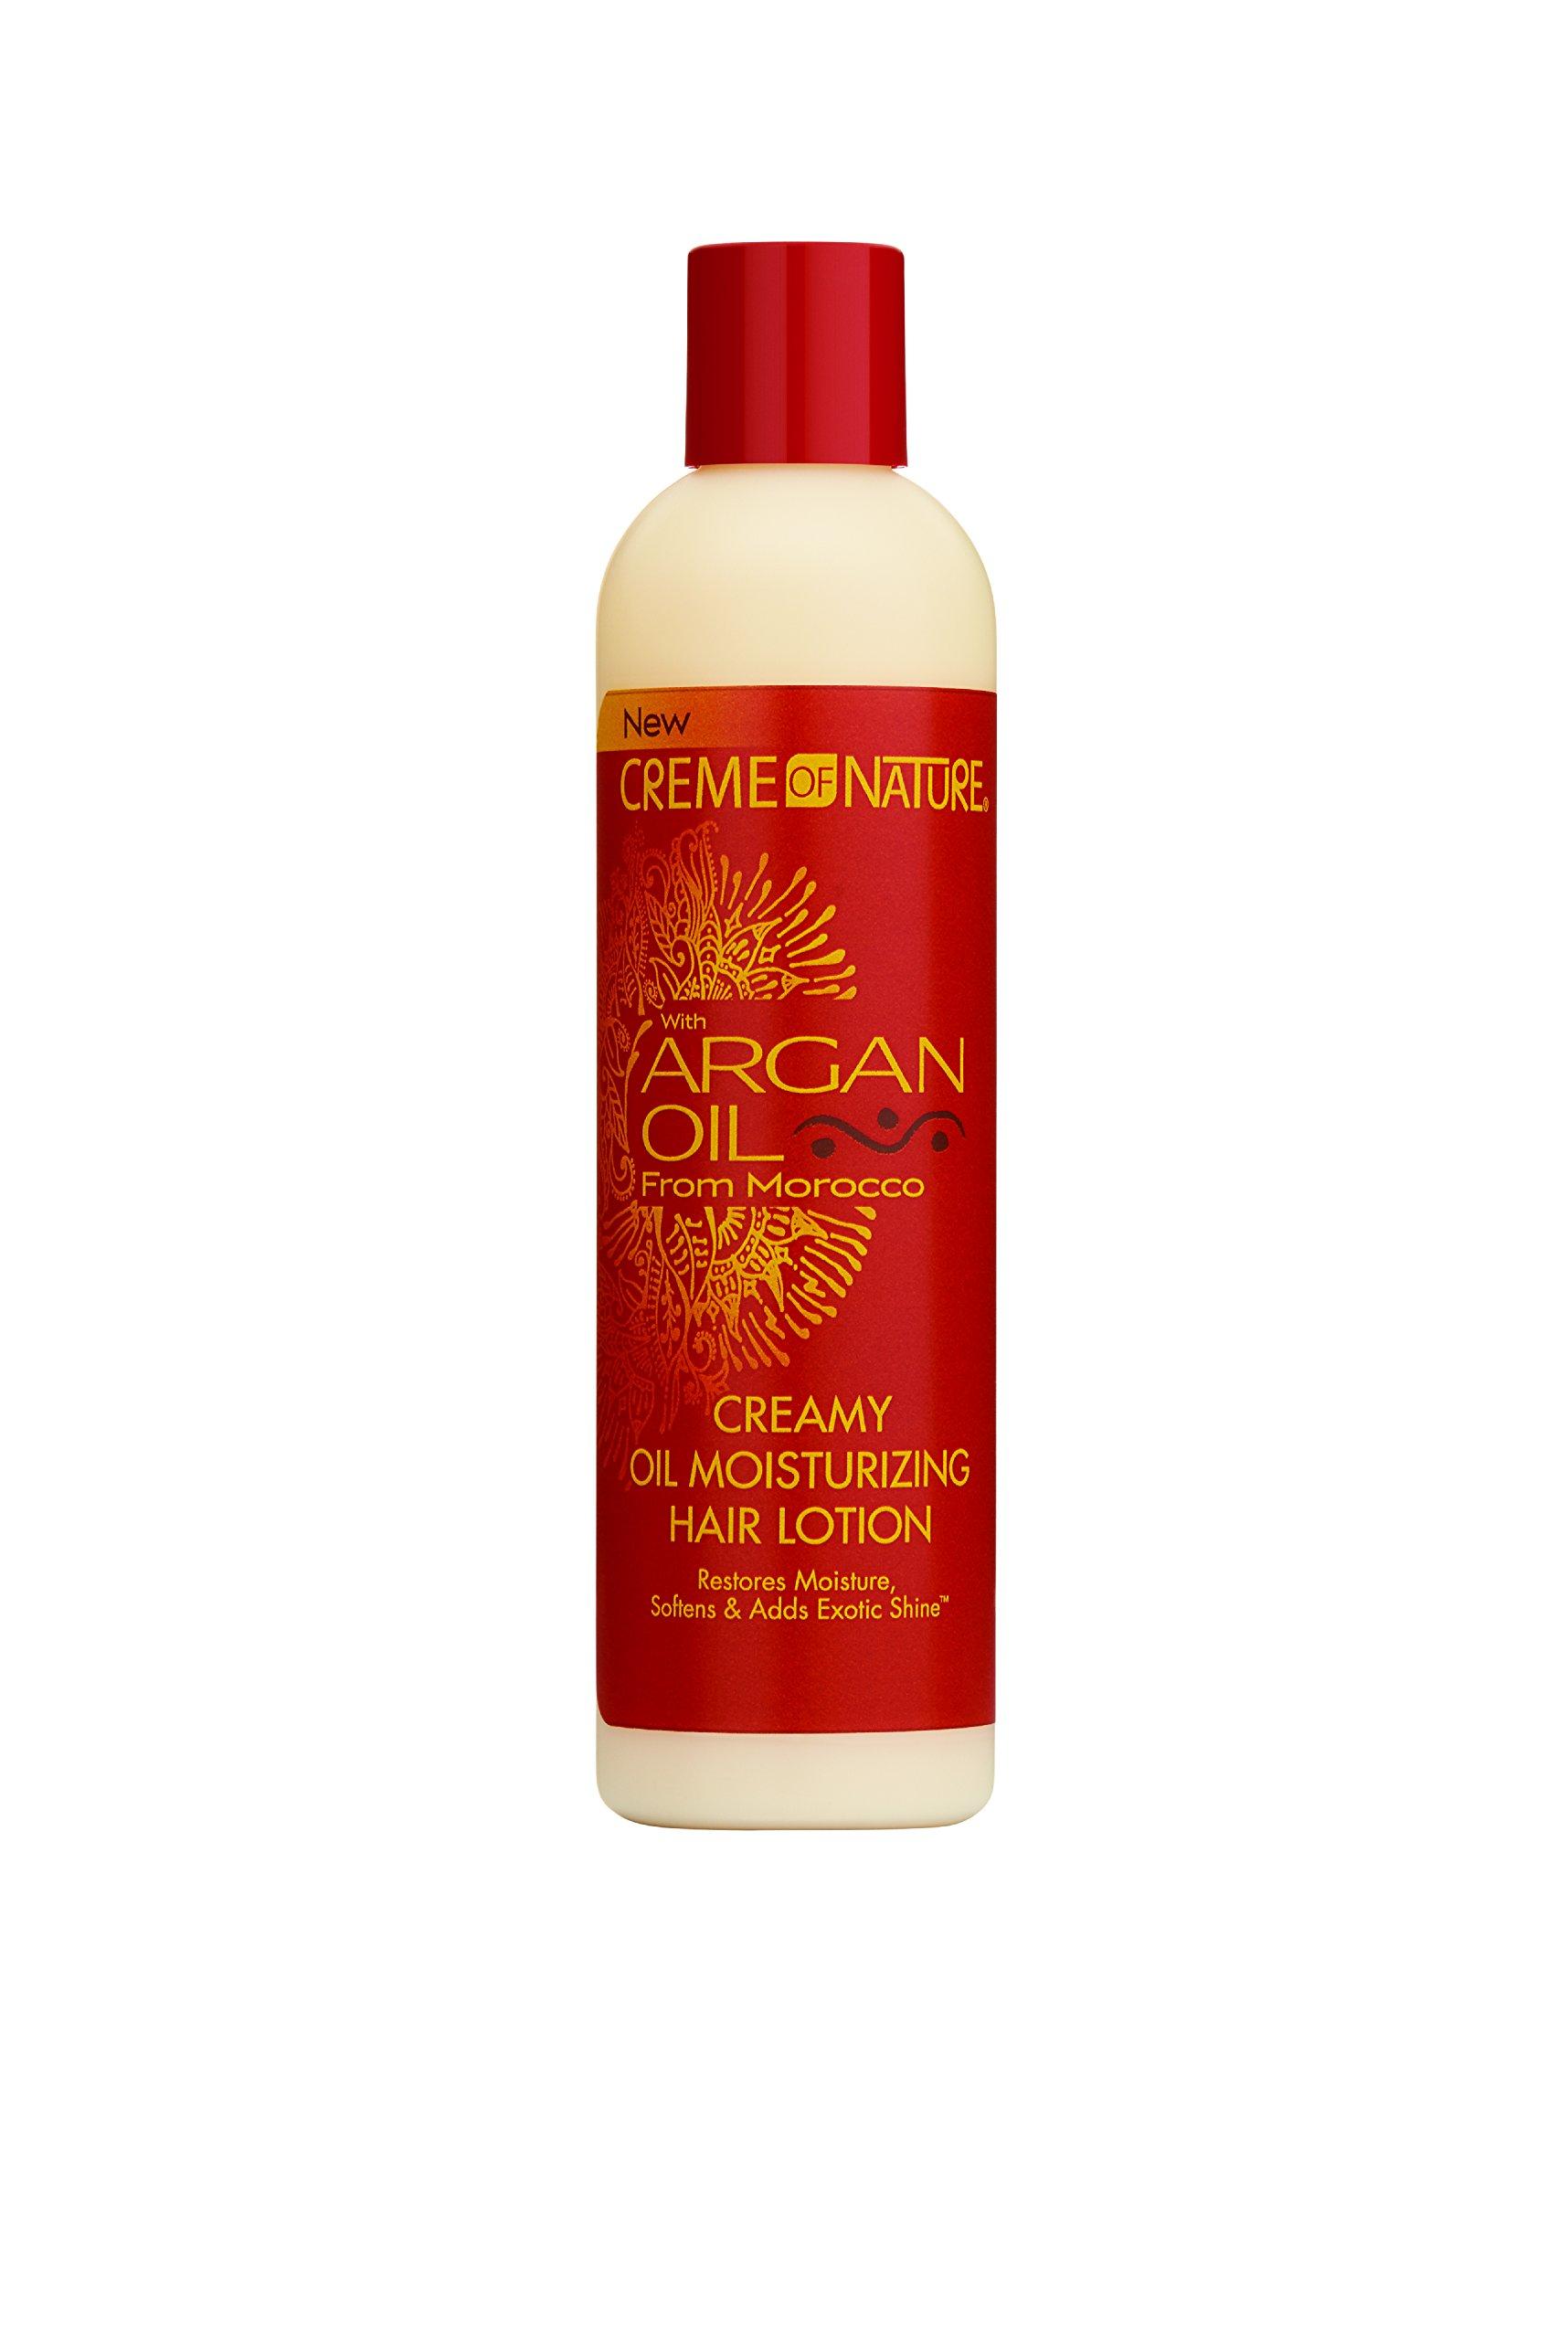 creme of nature argan oil shampoo review